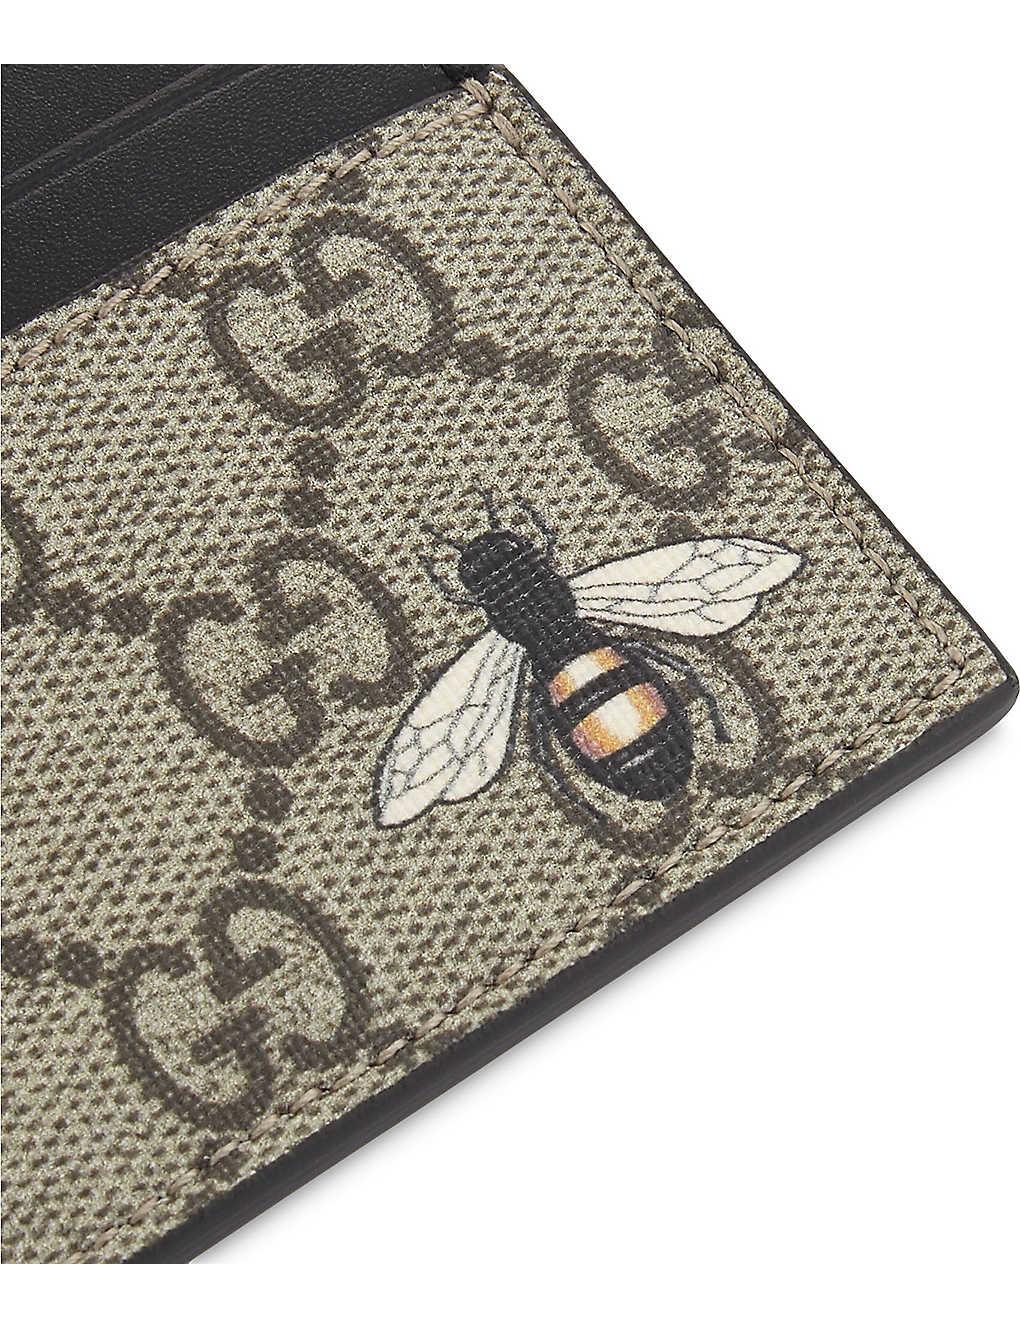 211520cbef7 GUCCI - Bestiary GG Supreme card holder